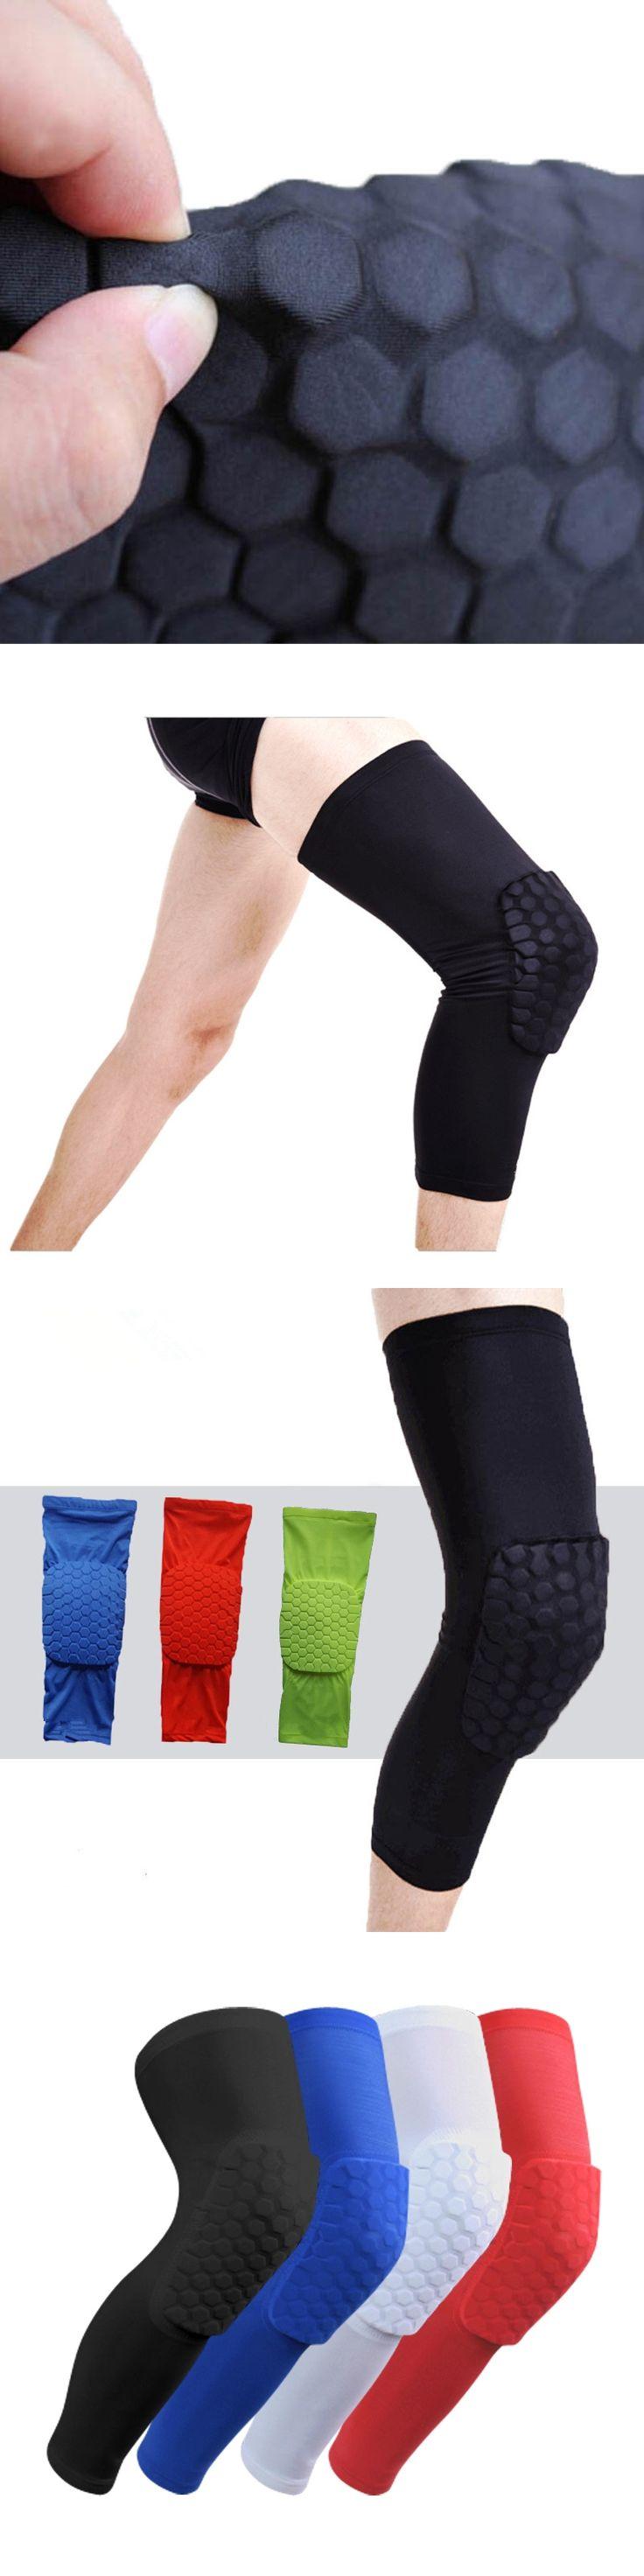 100% Top Famous Brand Basketball Leg Sleeve Breathable Sport Safety Kneepad Honeycomb Pad Bumper Barce Kneelet Protector 2PCS